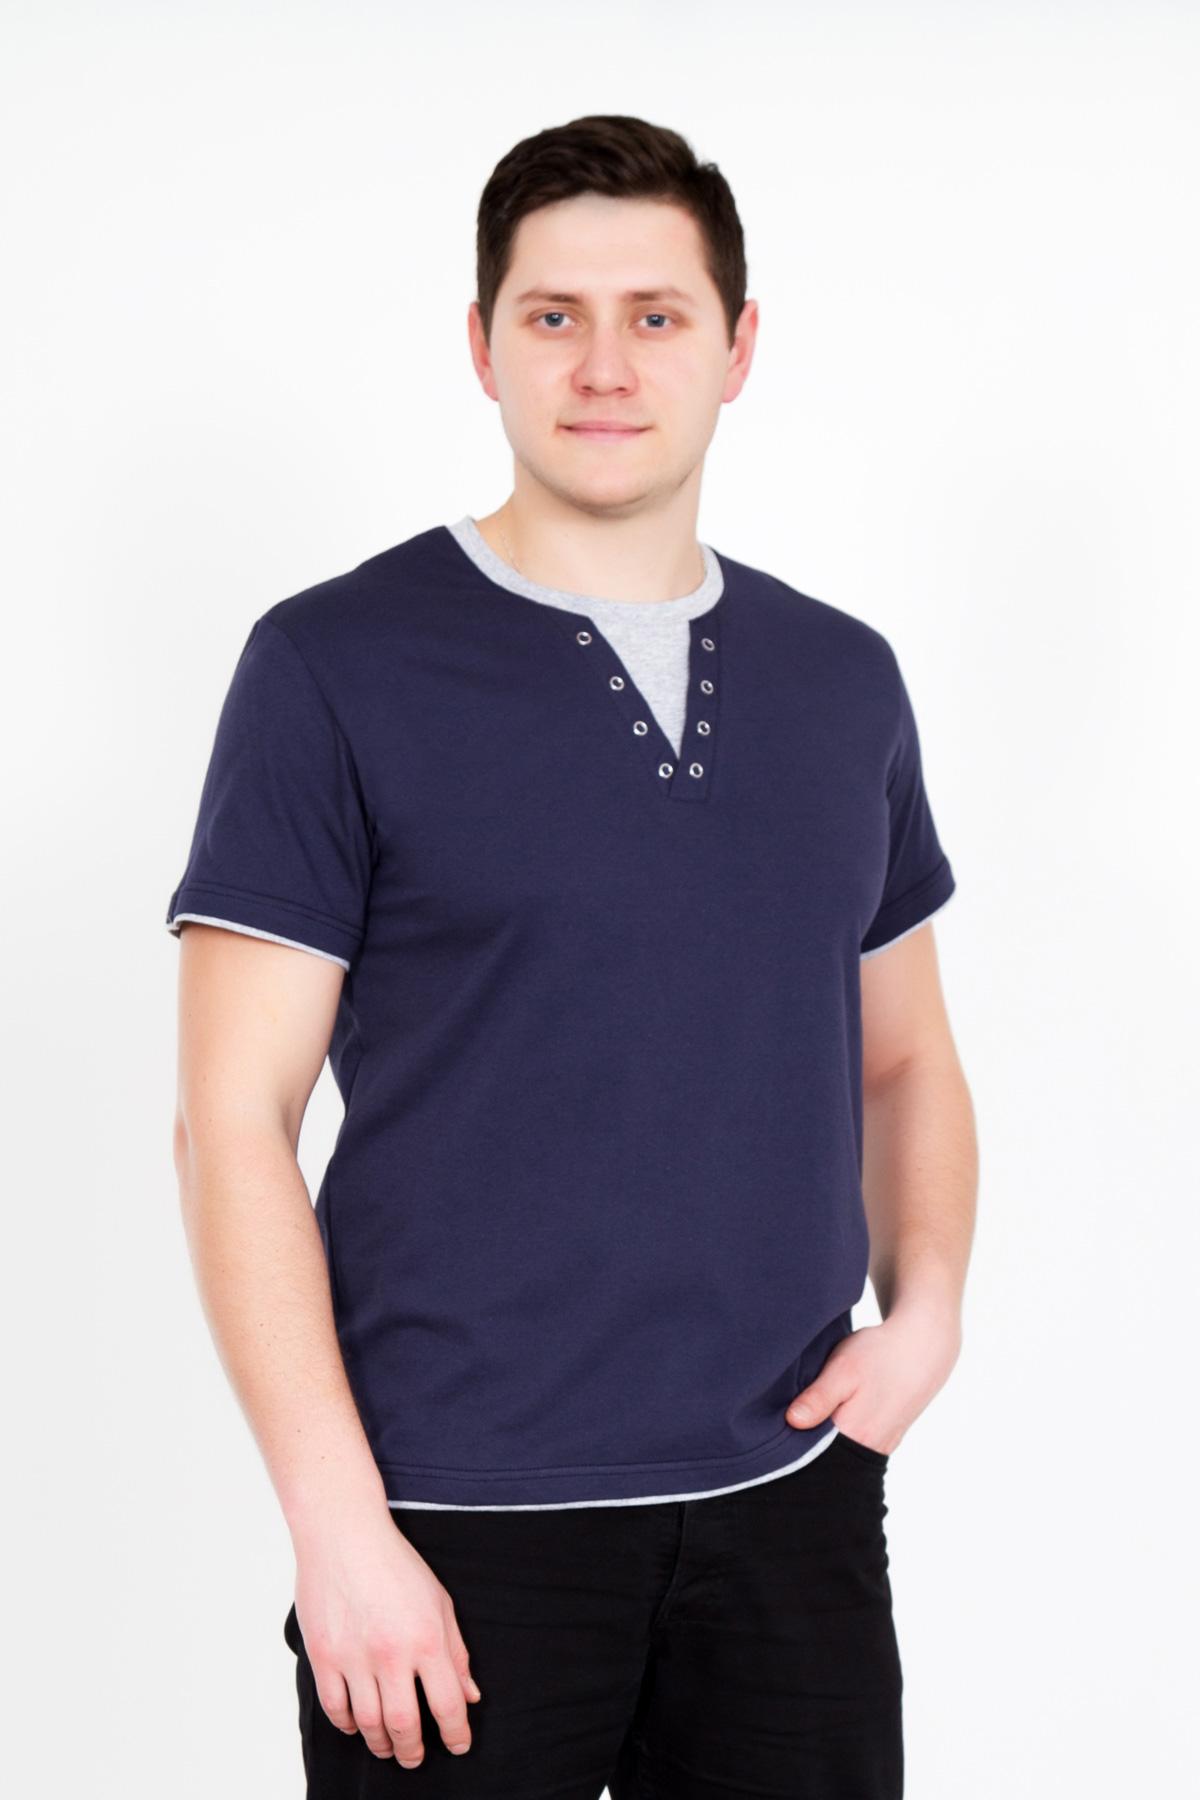 Муж. футболка Джон Синий р. 48Майки и футболки<br>Факт. ОГ: 100 см <br>Факт. ОТ: 96 см <br>Факт. ОБ: 94 см <br>Длина по спинке: 68 см<br><br>Тип: Муж. футболка<br>Размер: 48<br>Материал: Кулирка